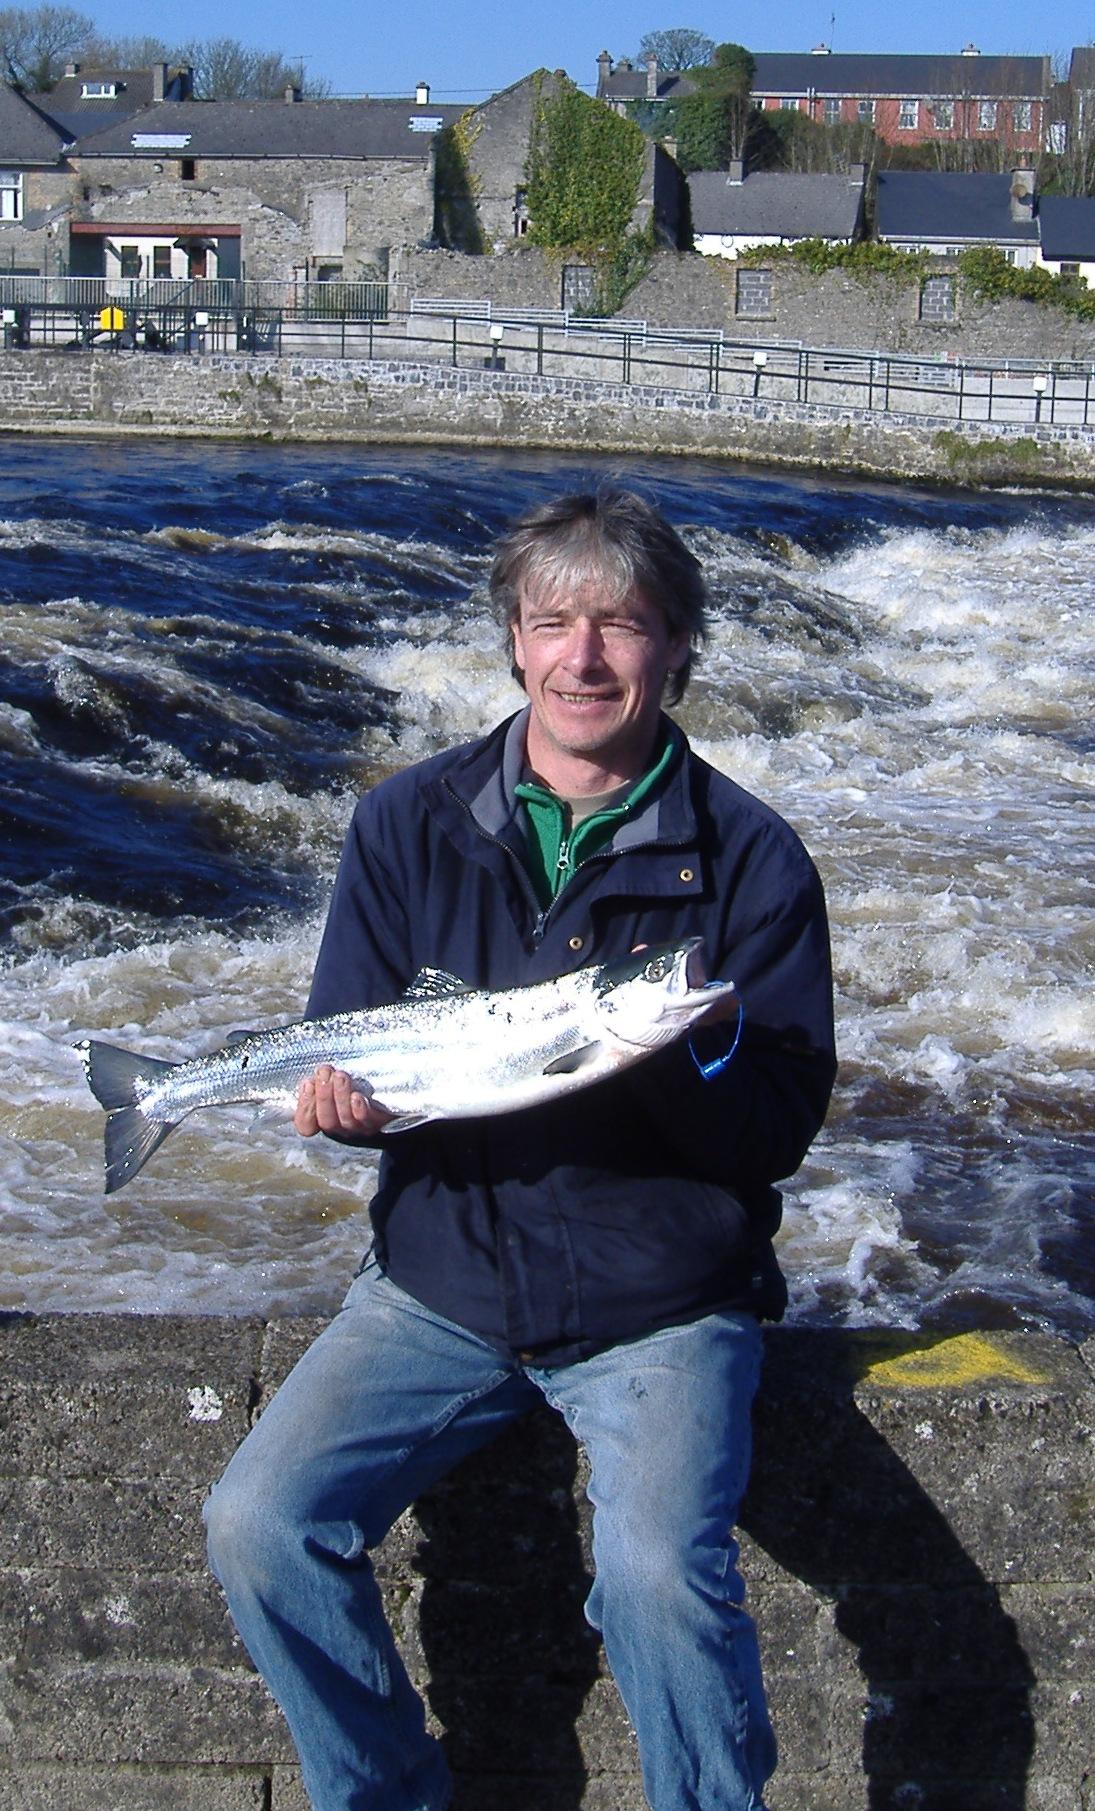 First_Salmon_River_Moy_2013_BSA_Brendan_McMenamin_20130224_1.jpg